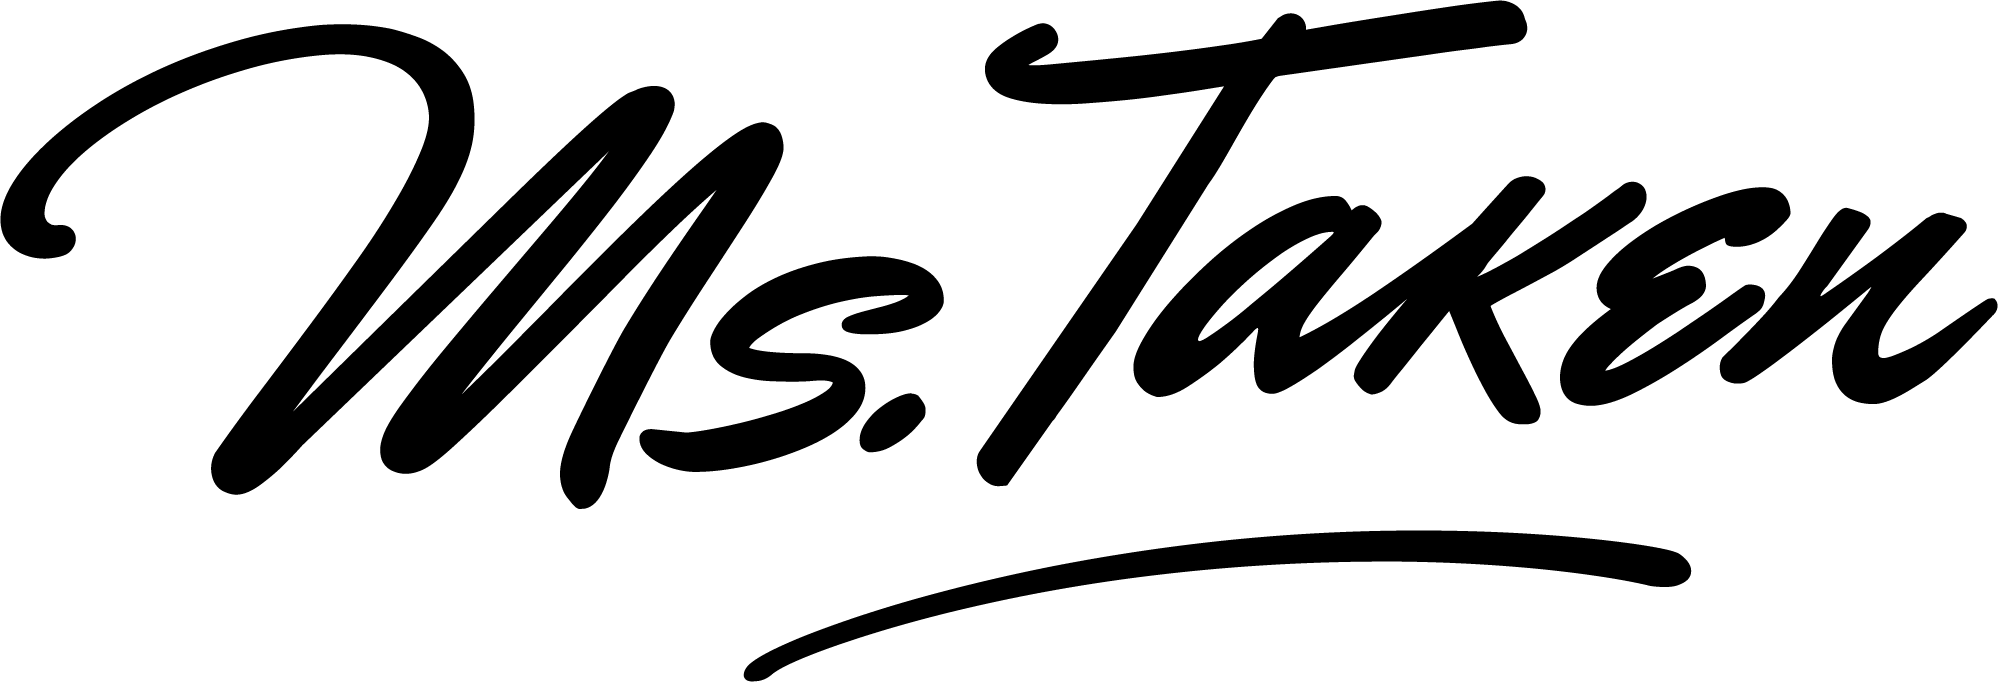 wrogn logo